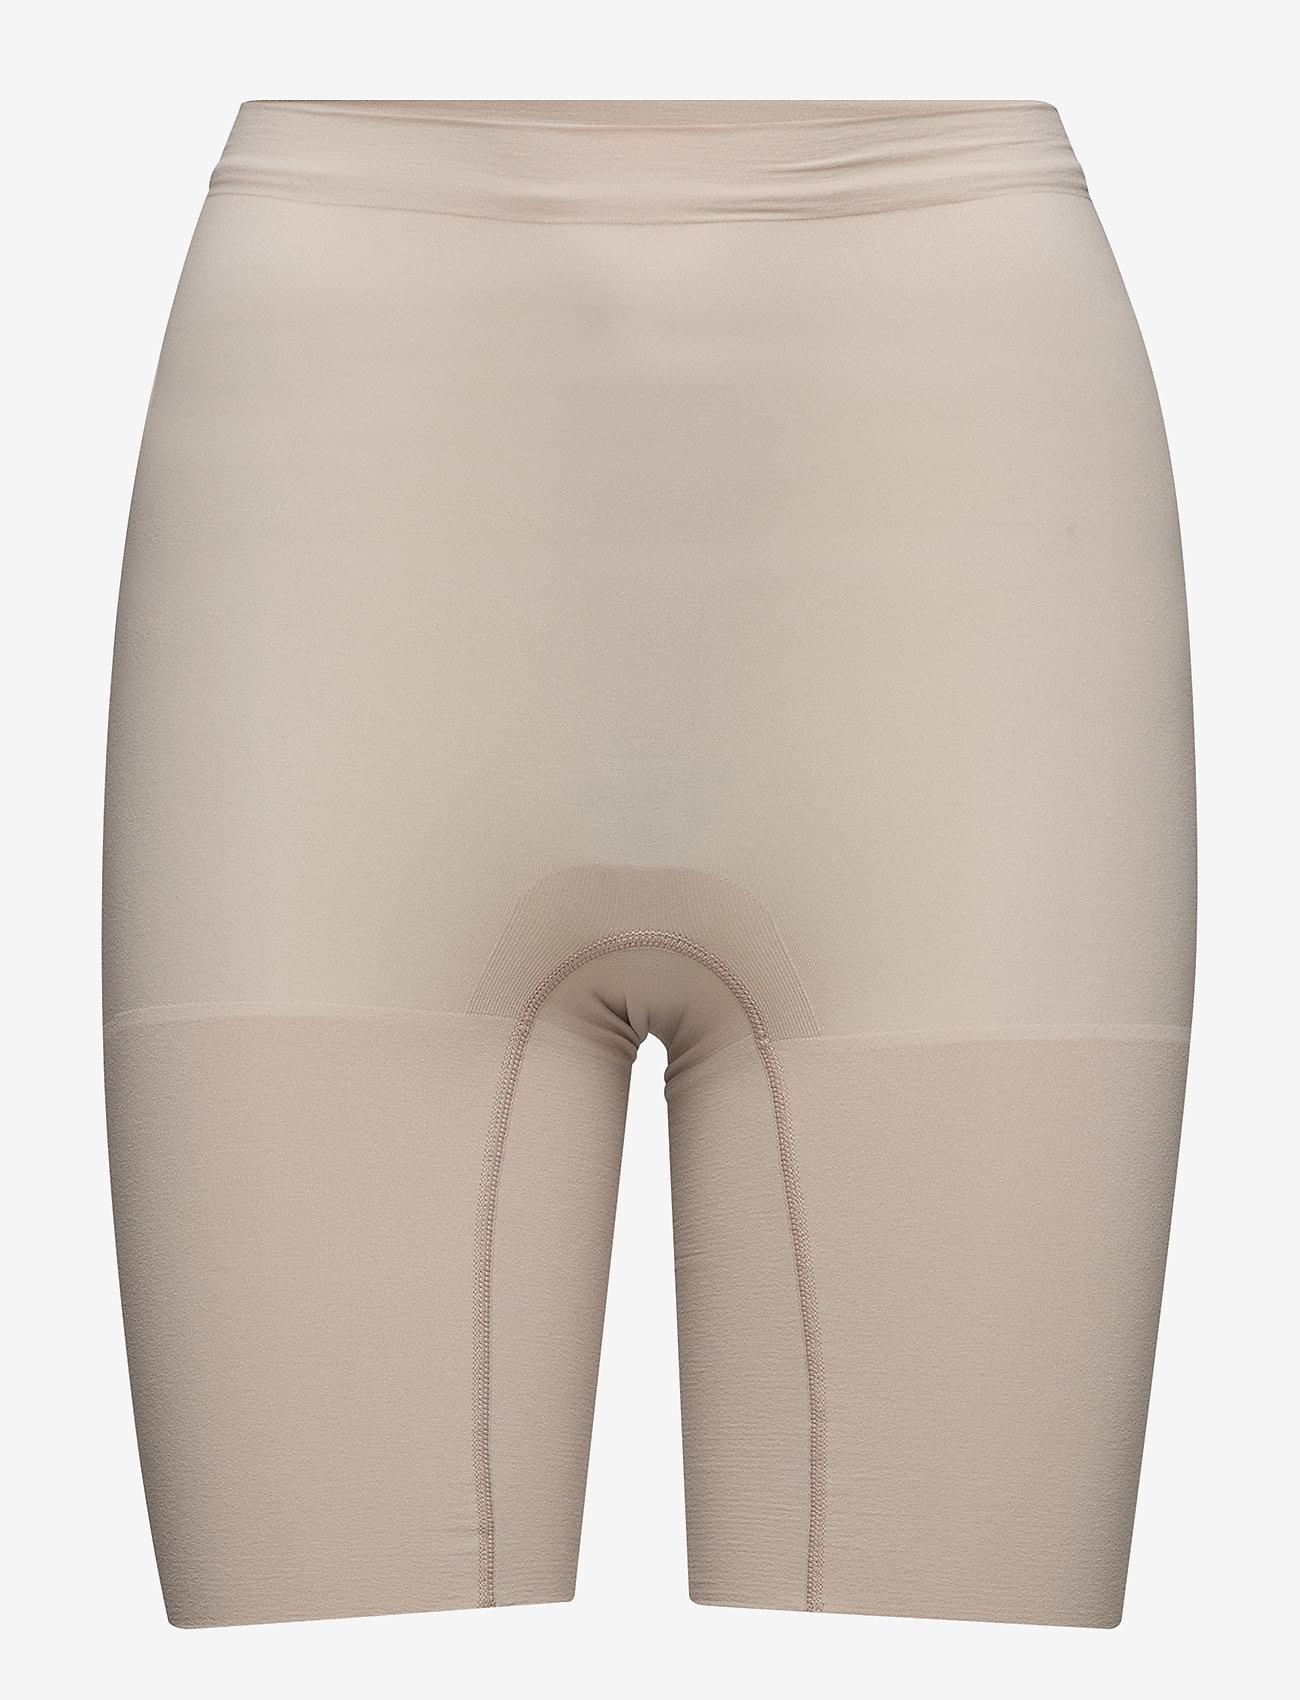 Spanx - POWER SHORT - bottoms - soft nude - 0